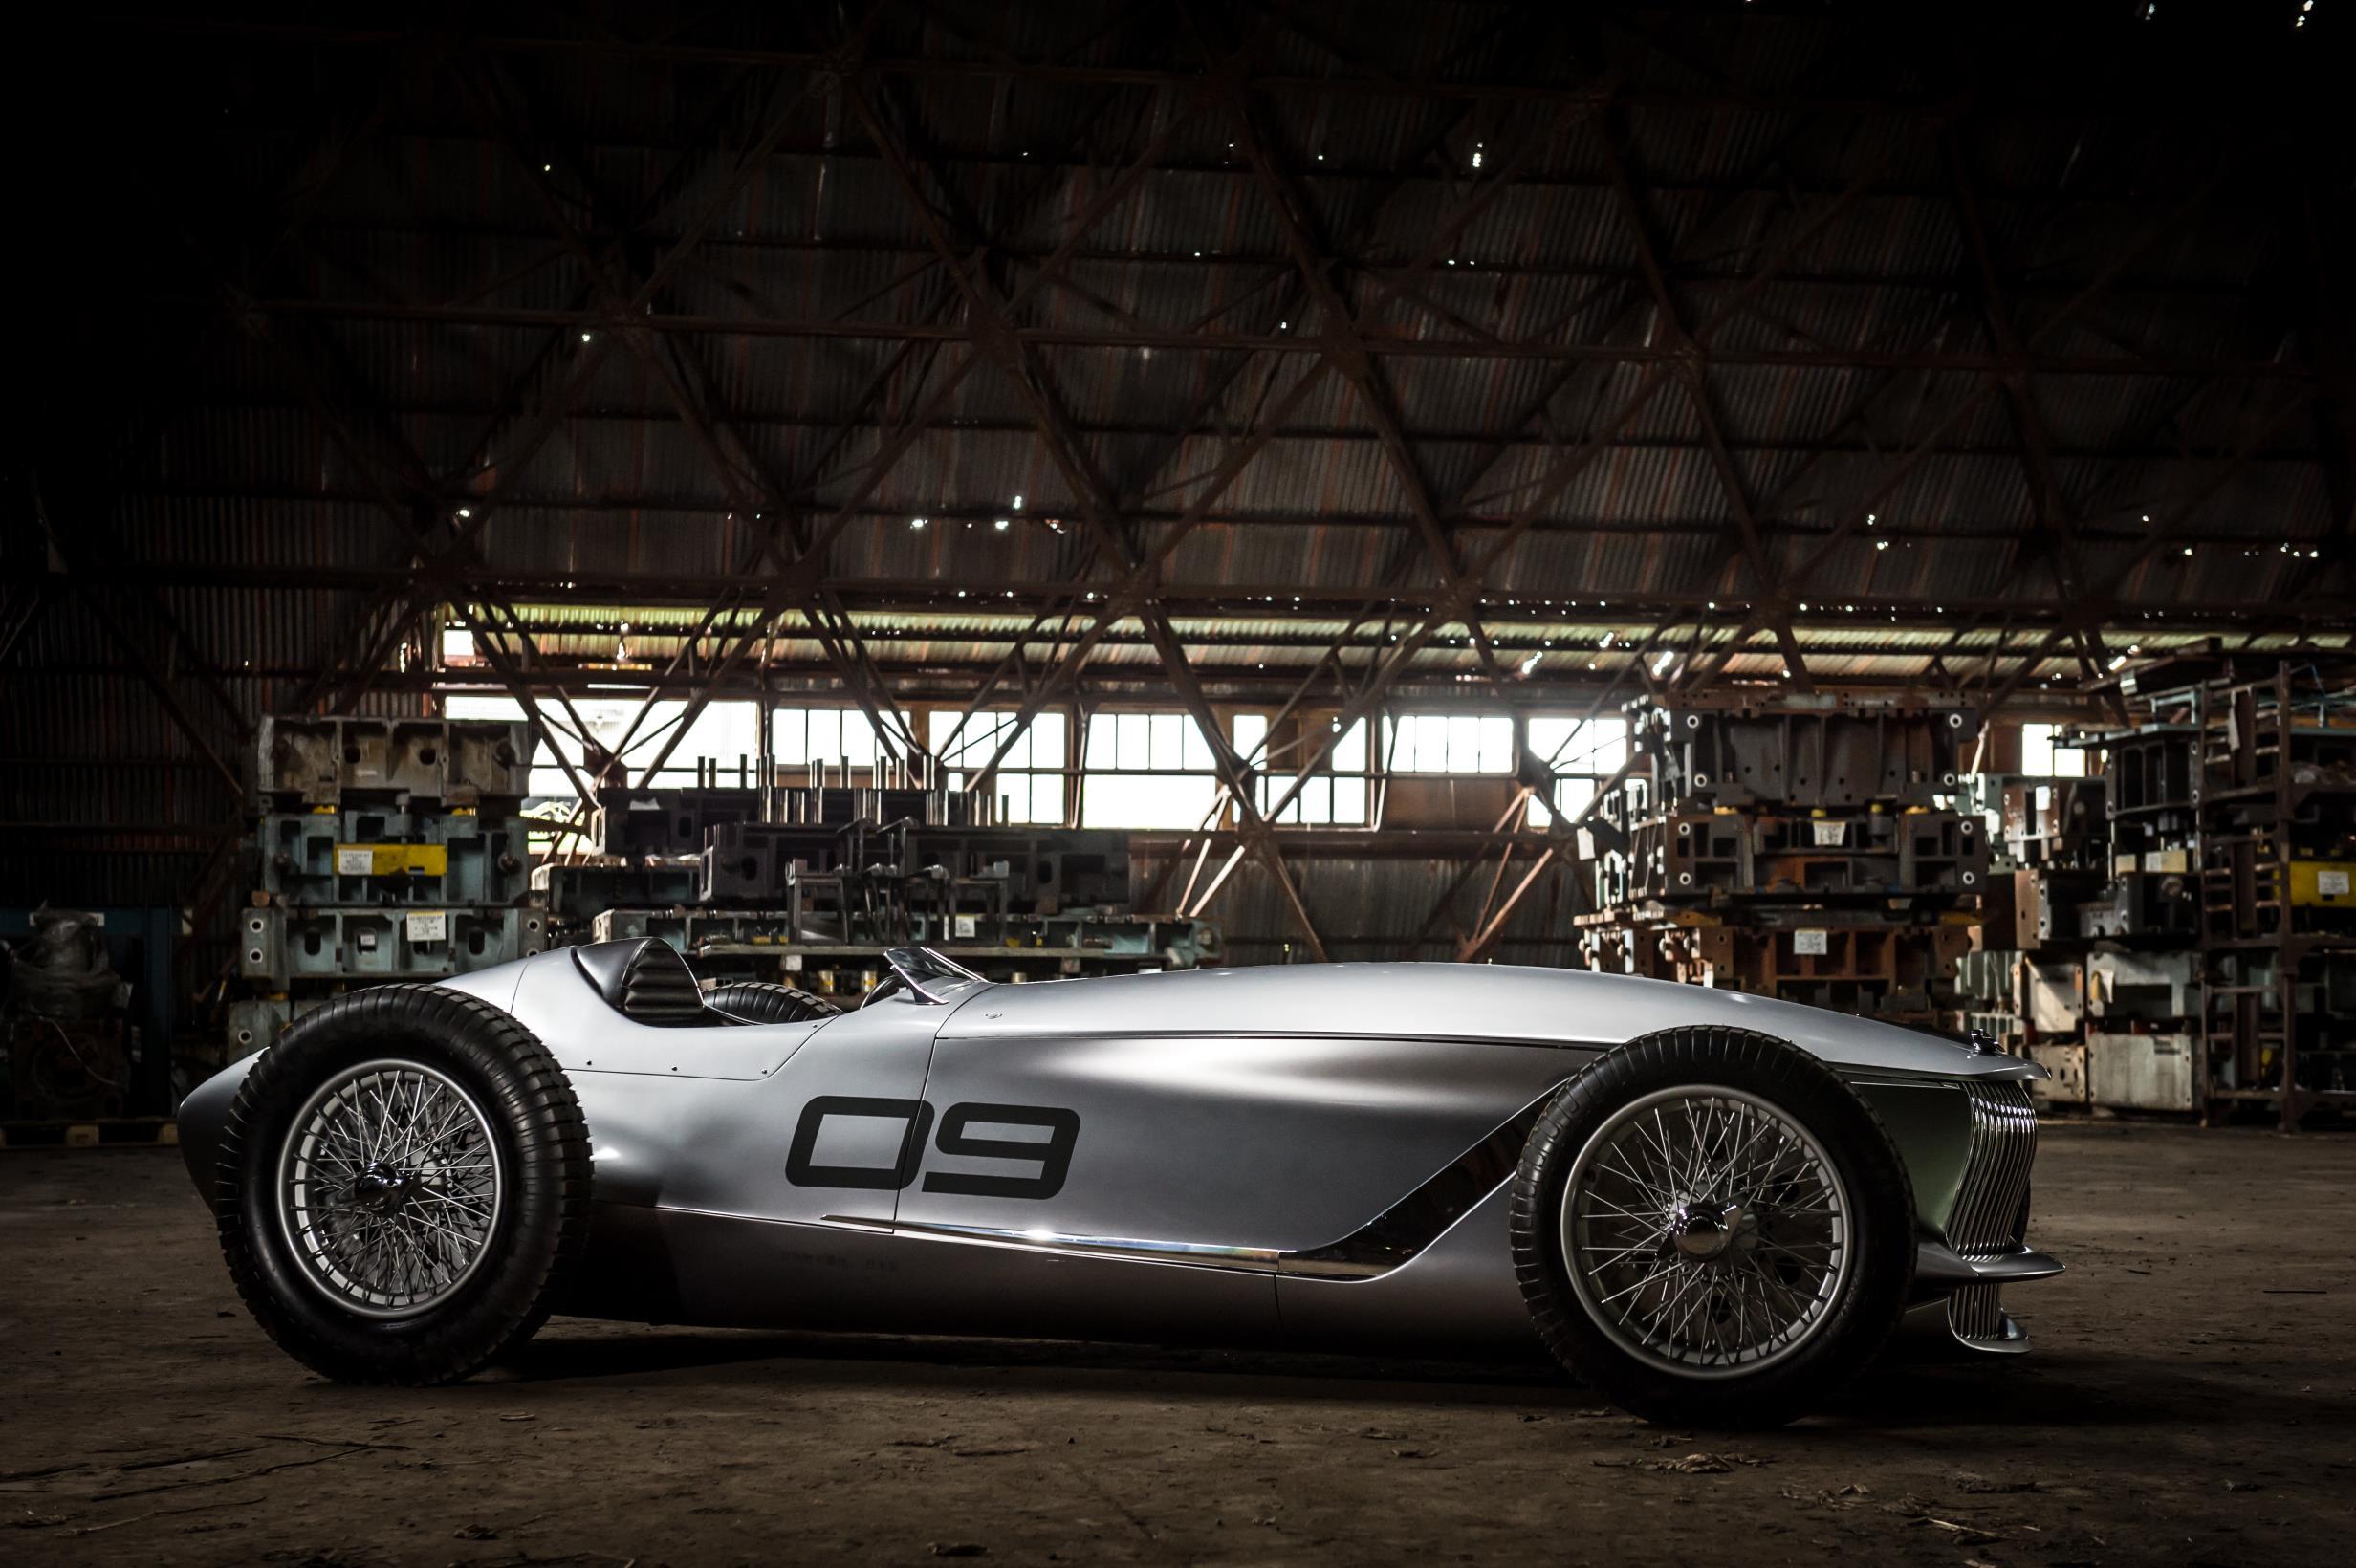 Infiniti reveal 'Prototype 9' at Pebble Beach